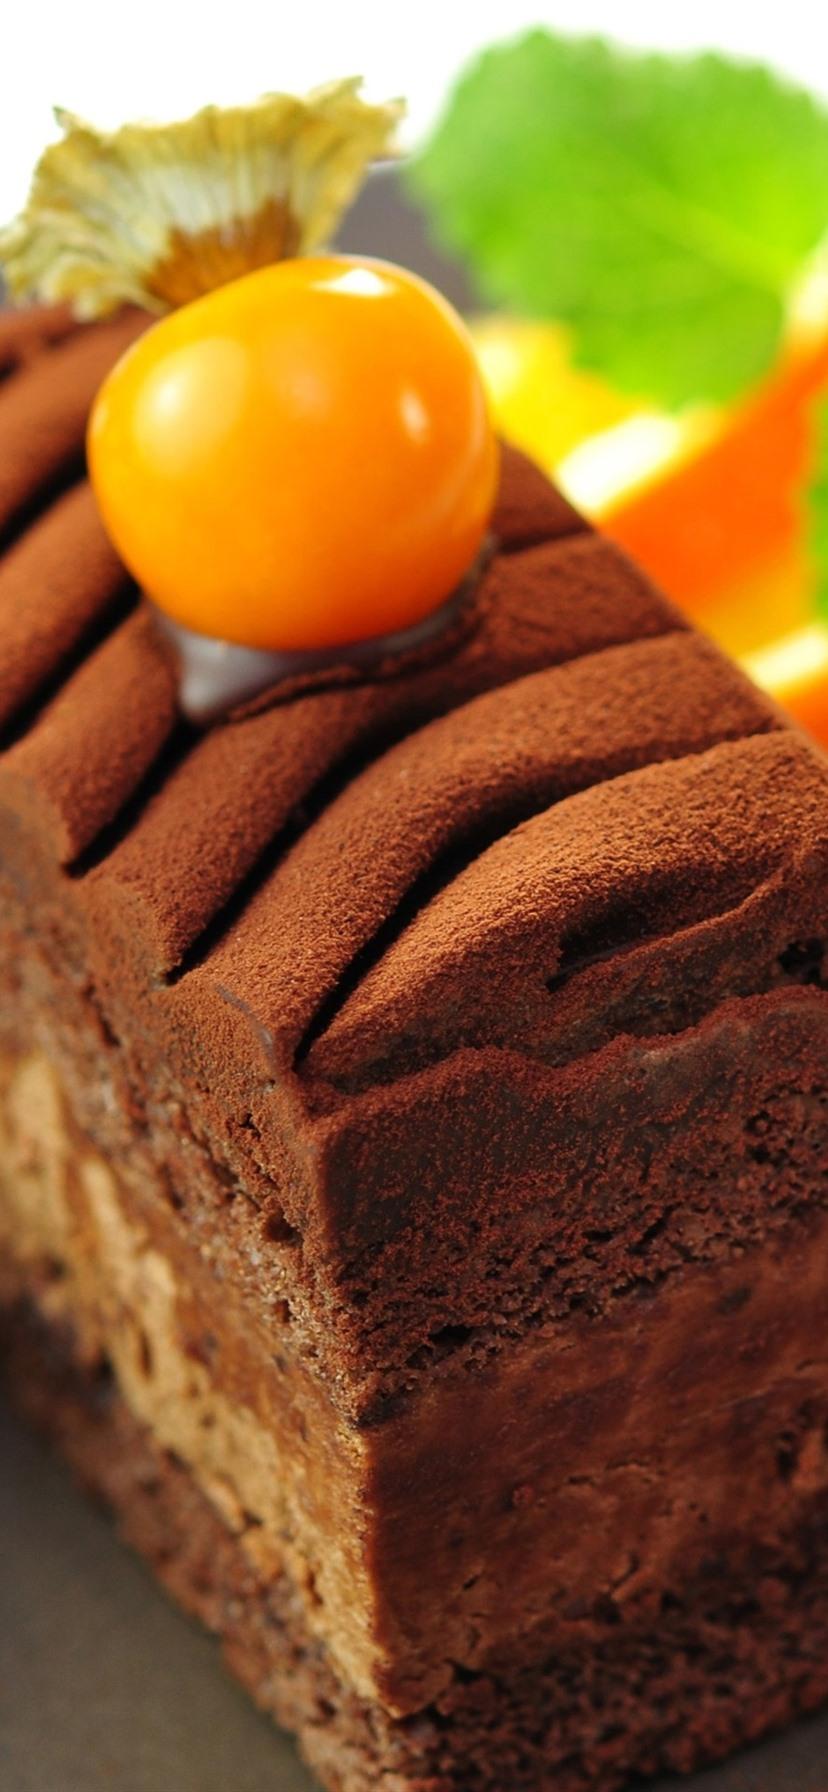 Wallpaper Dessert Food Chocolate Cake Orange Slice